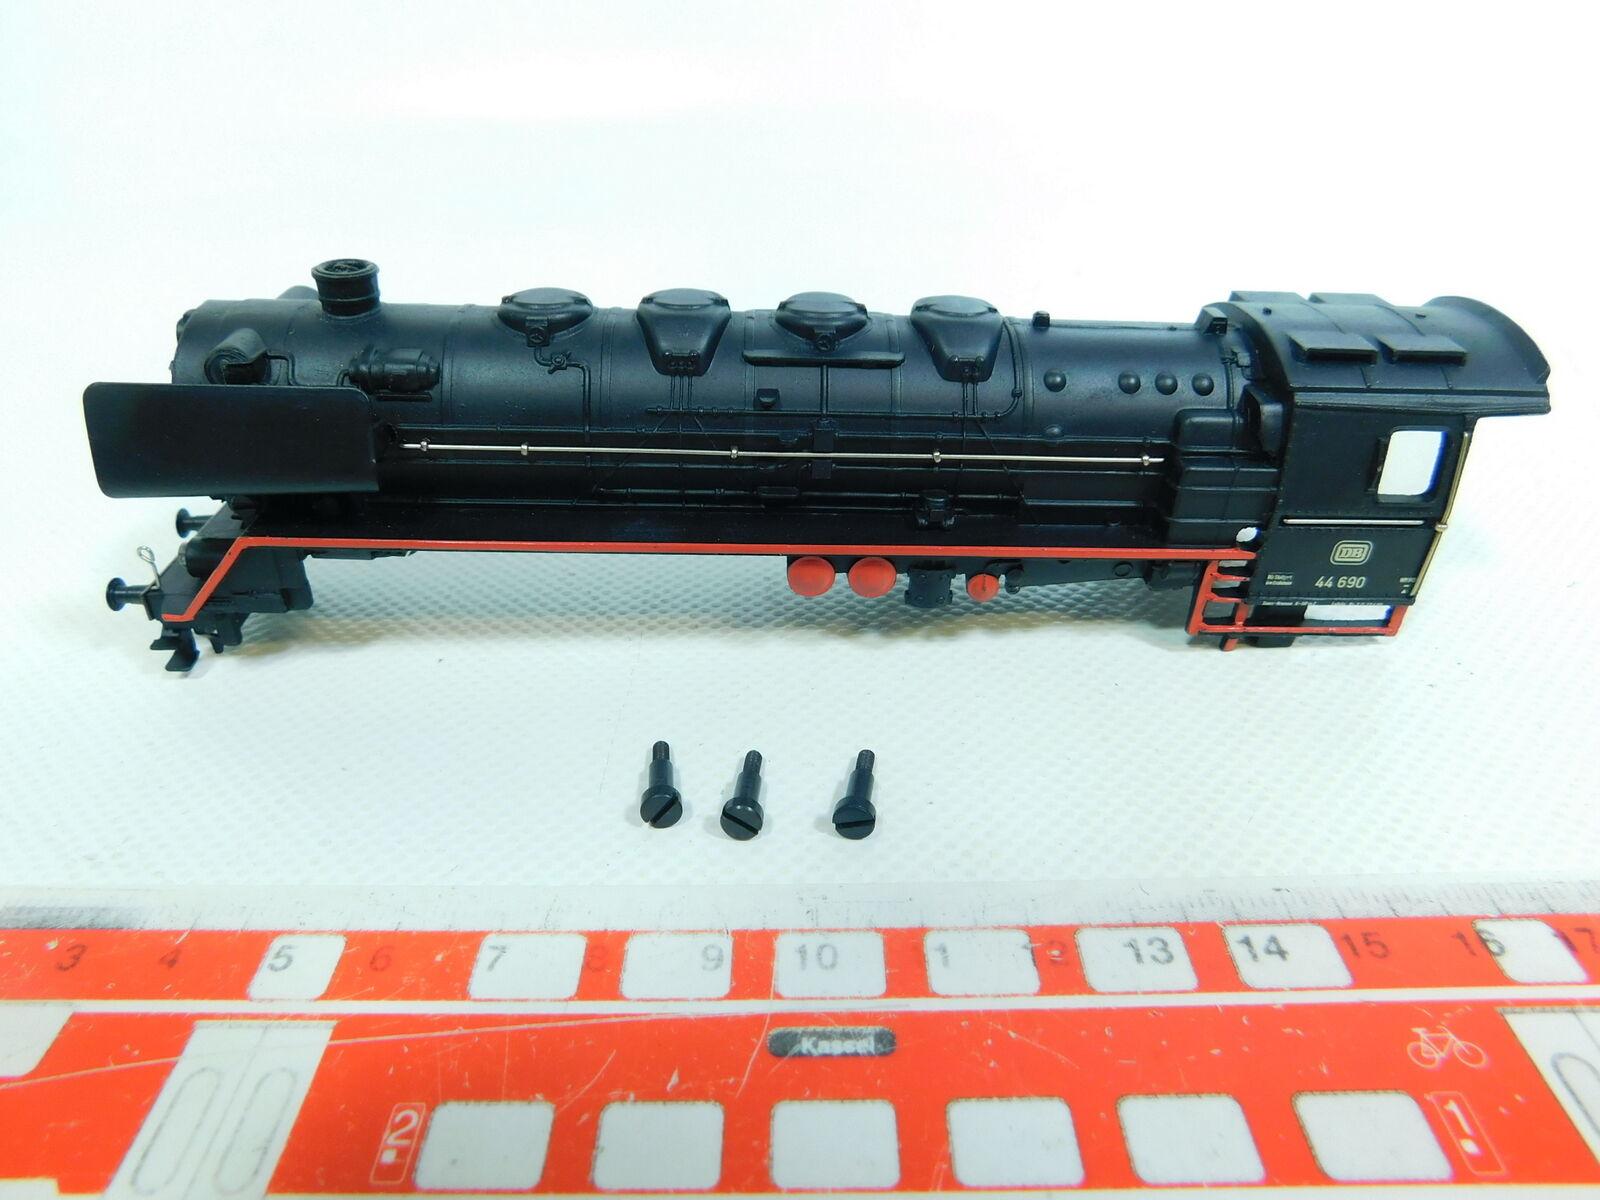 Bv588-0, 5 Märklin h0 Guss-Housing with Smoke Generator for 3047